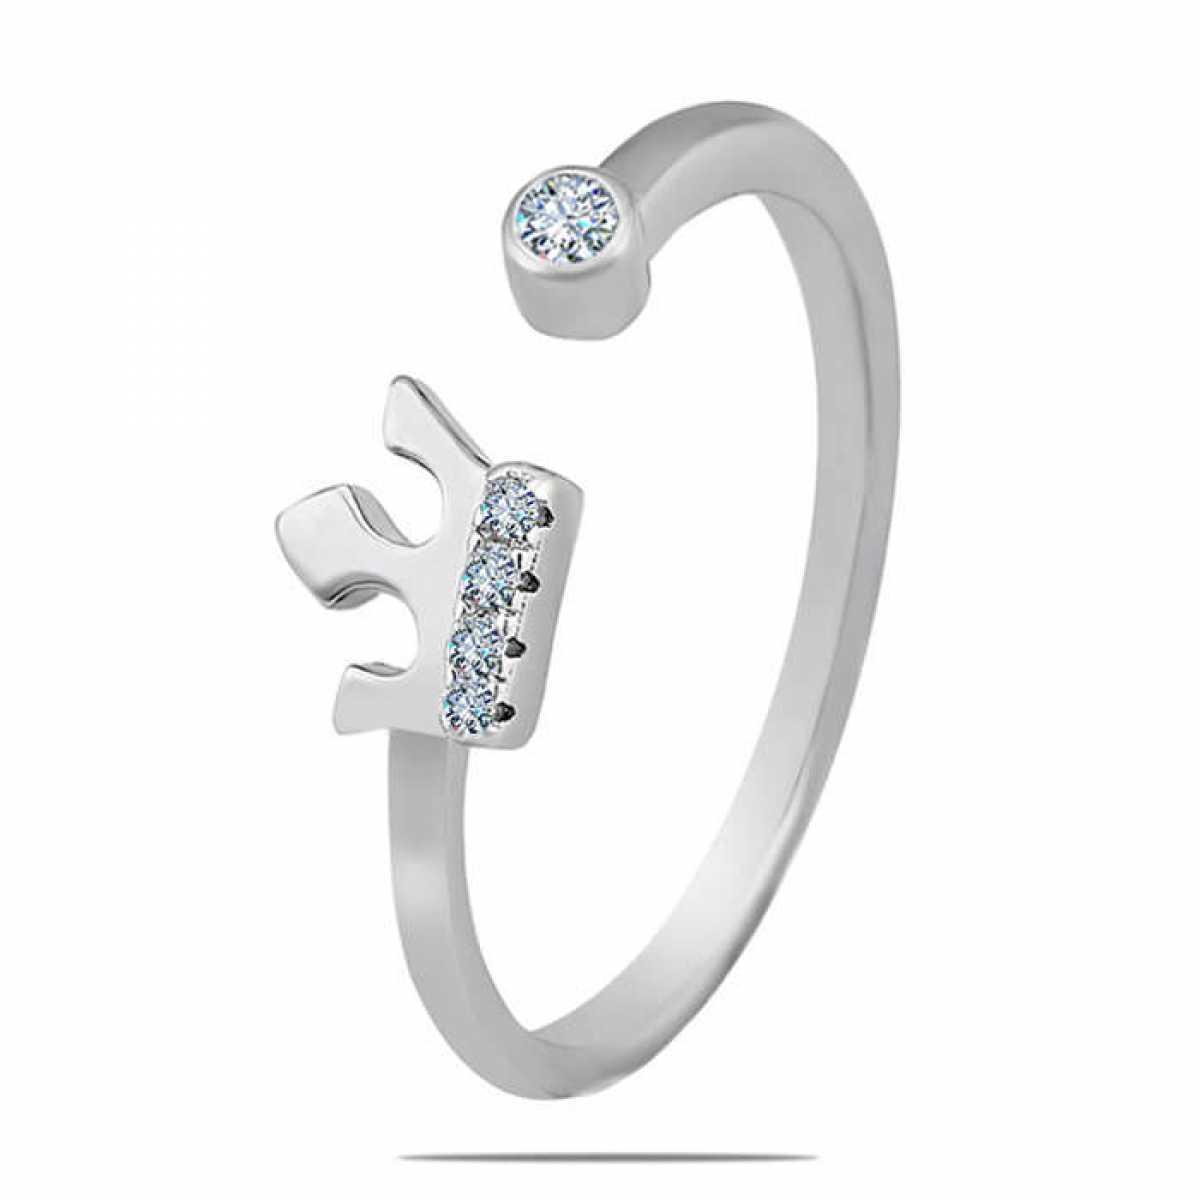 Royal Sterling Silver Ring